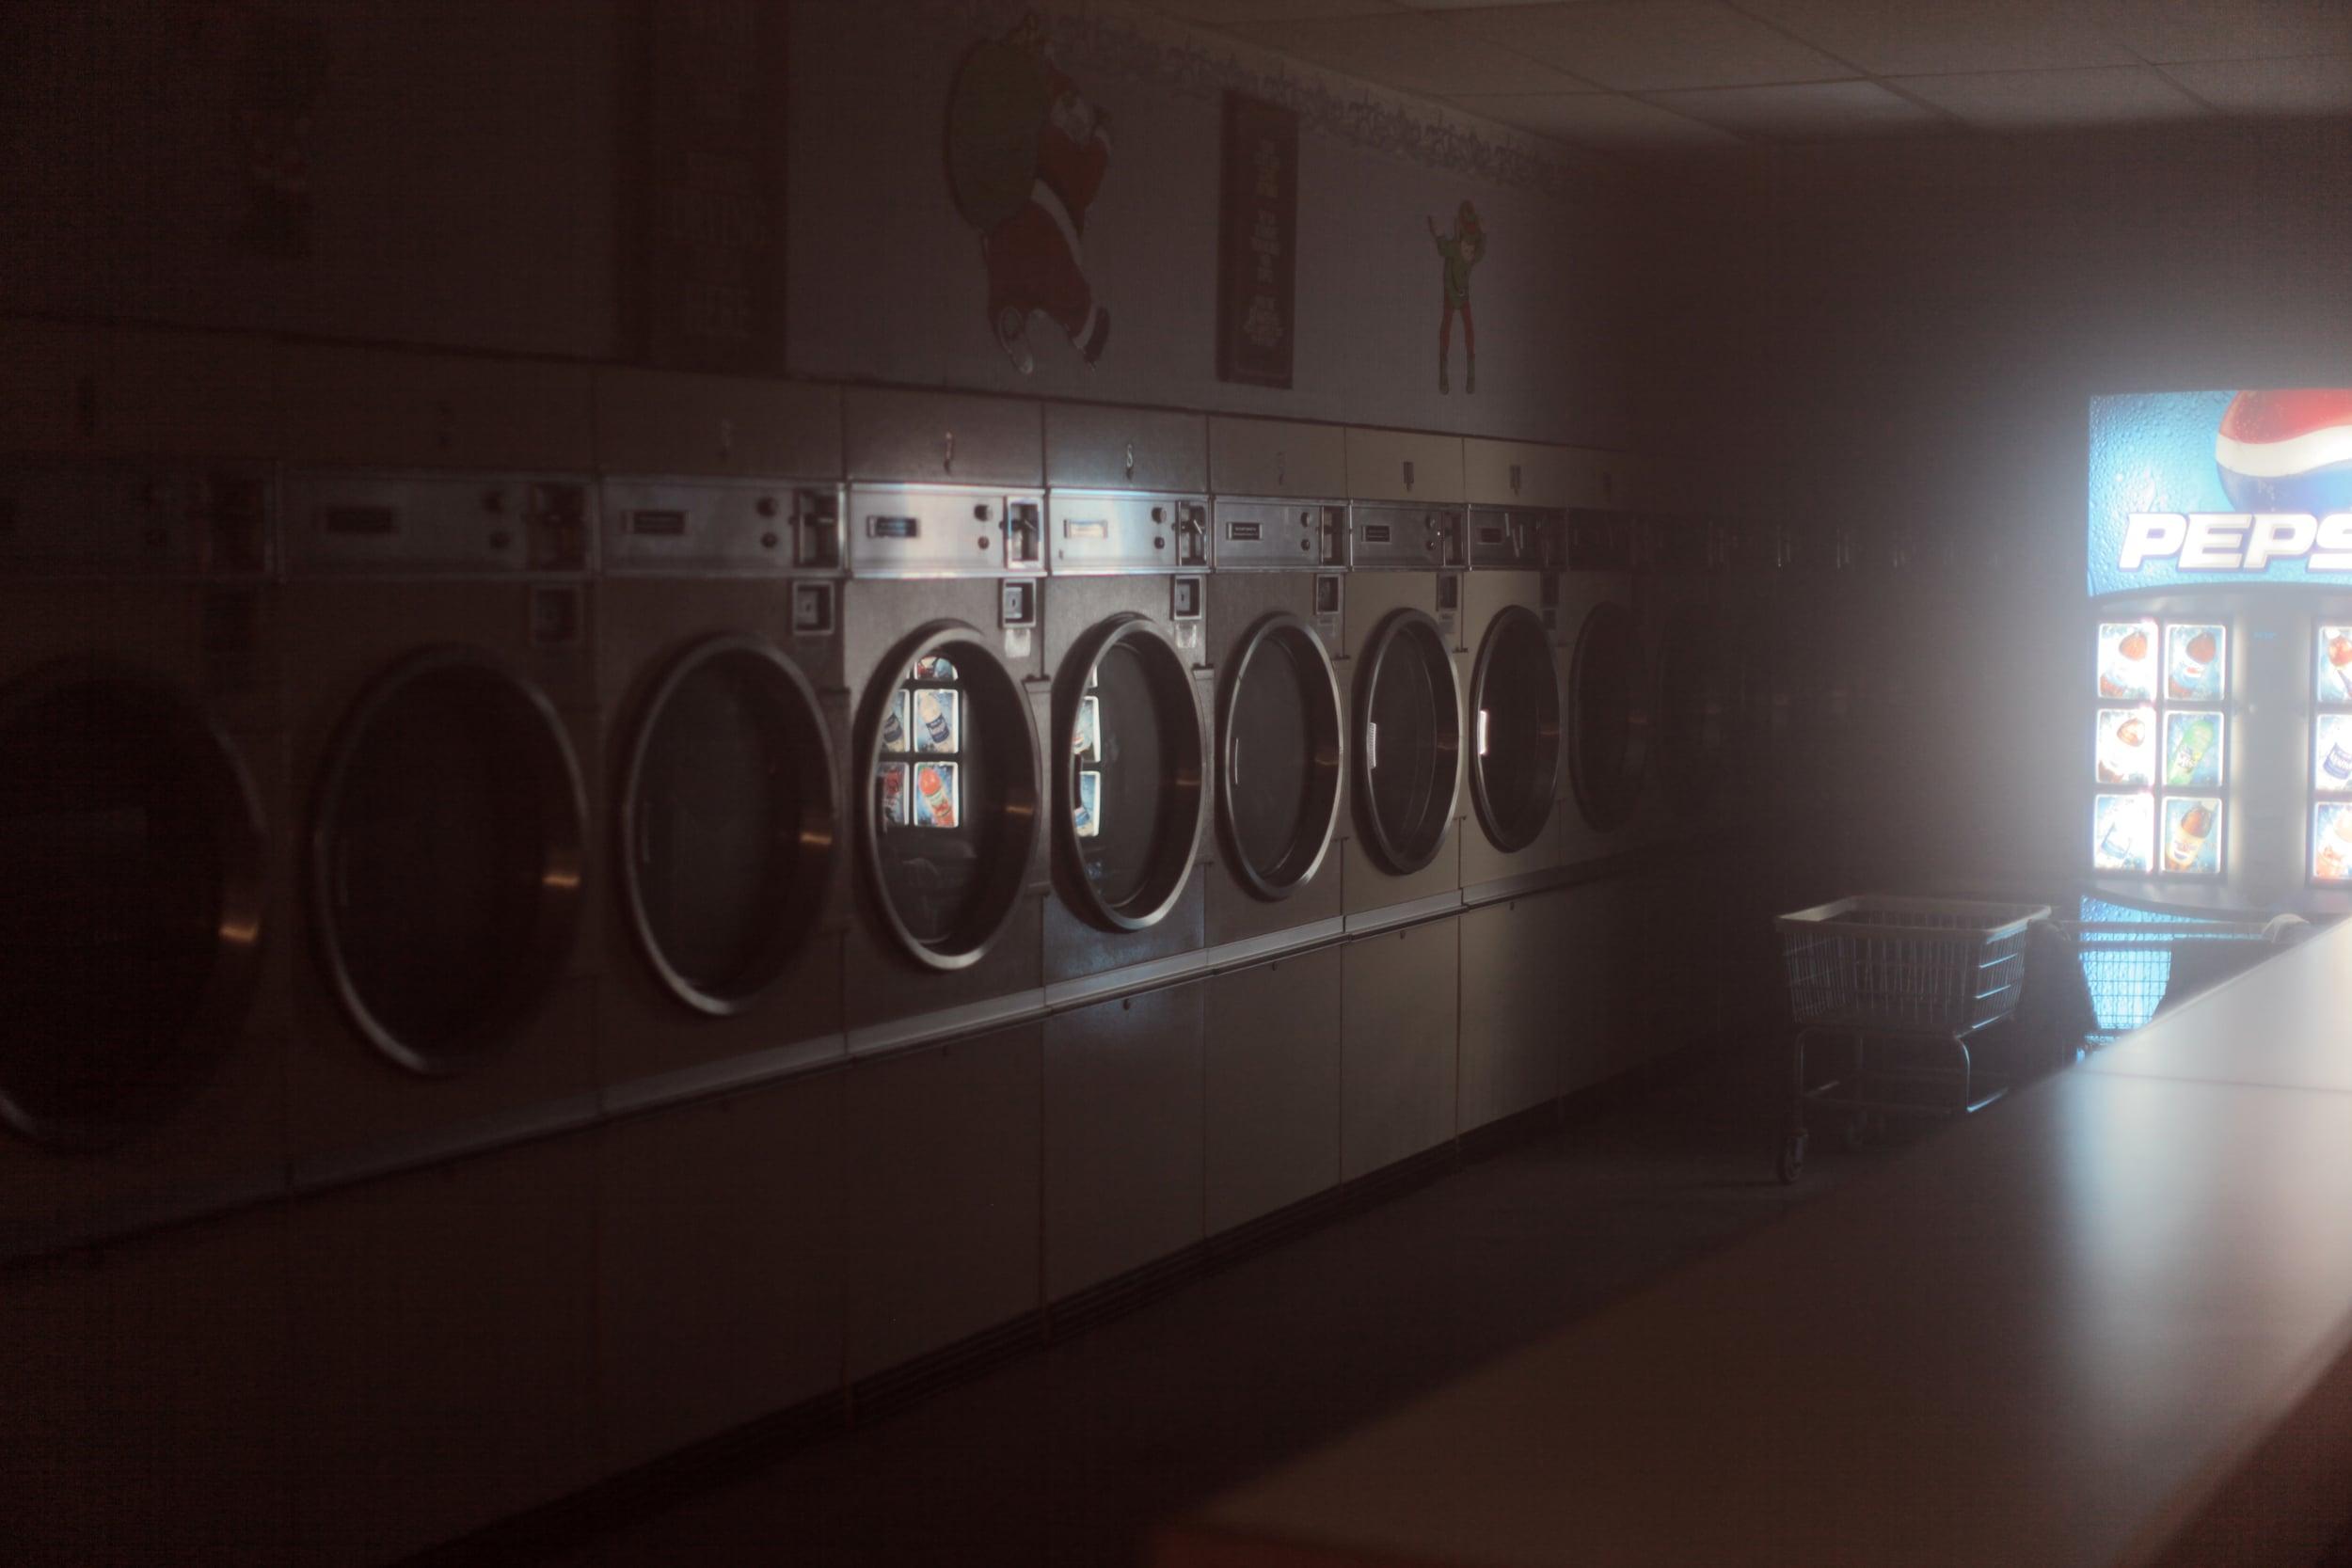 Pepsi laundromat.jpg